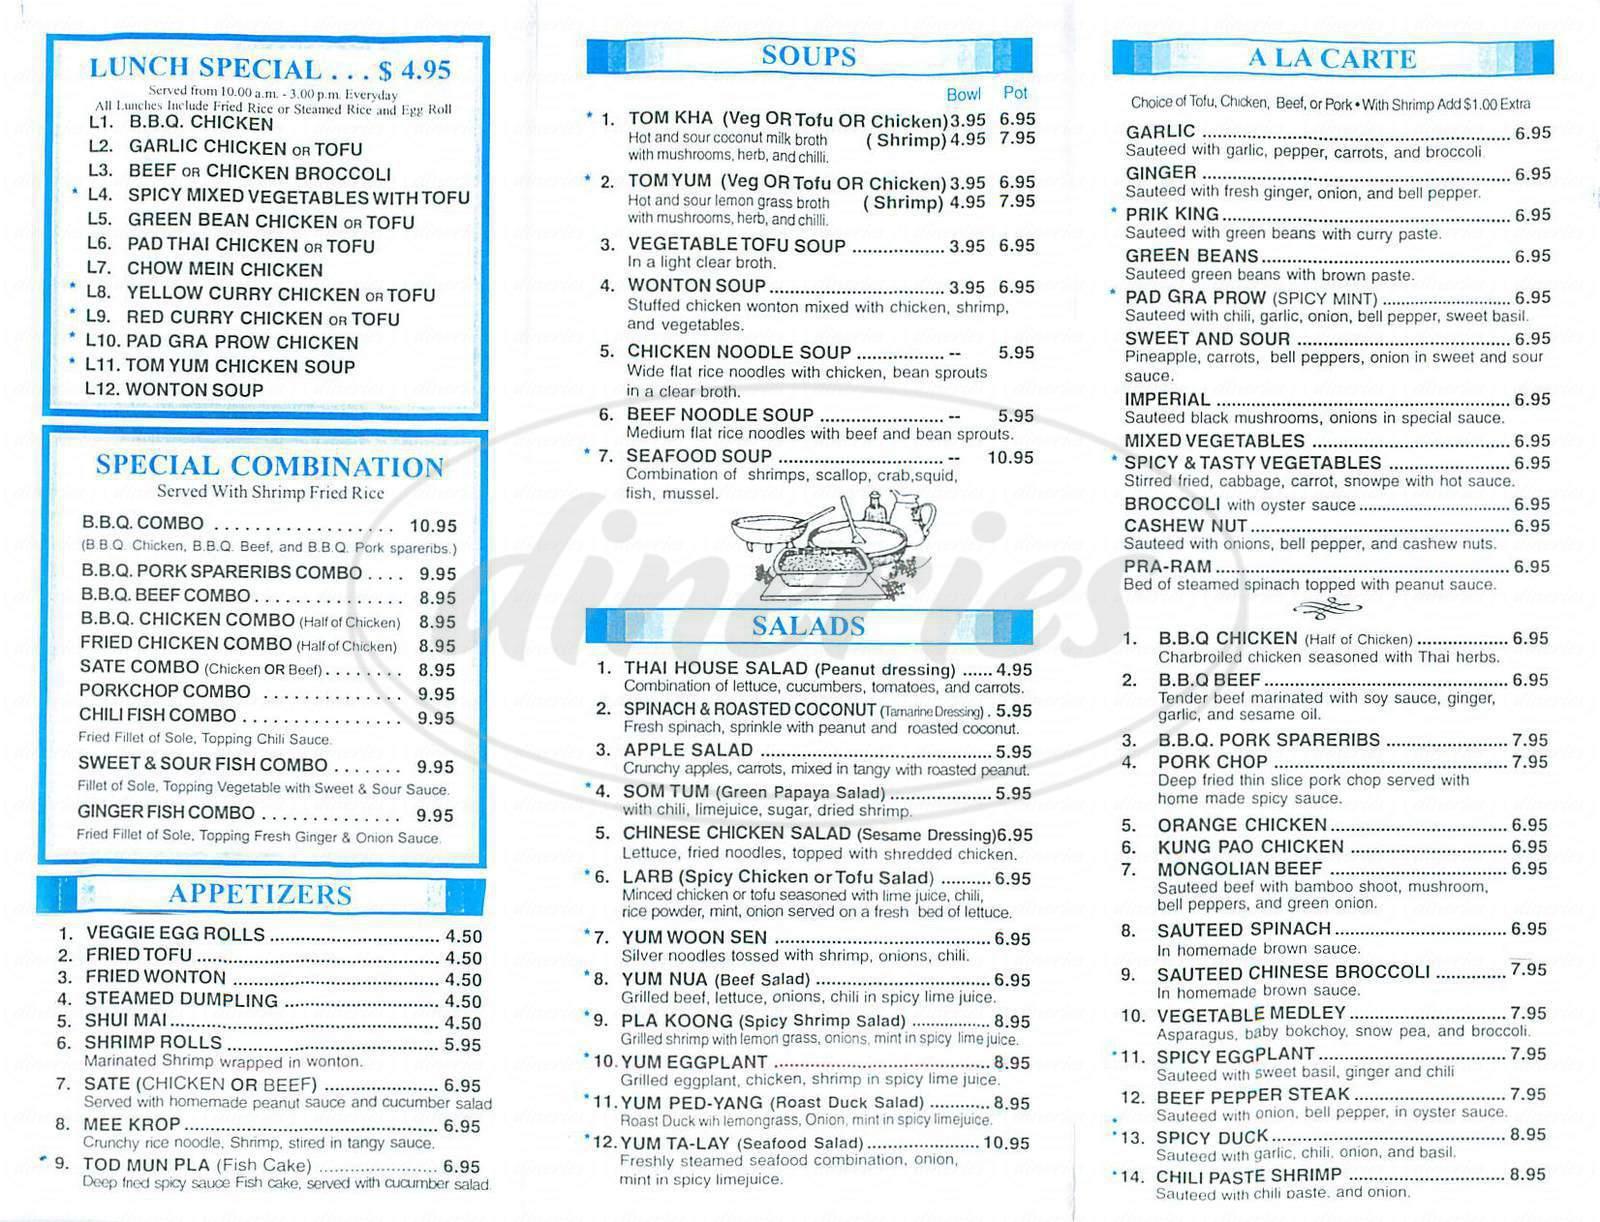 menu for Sicha Siam